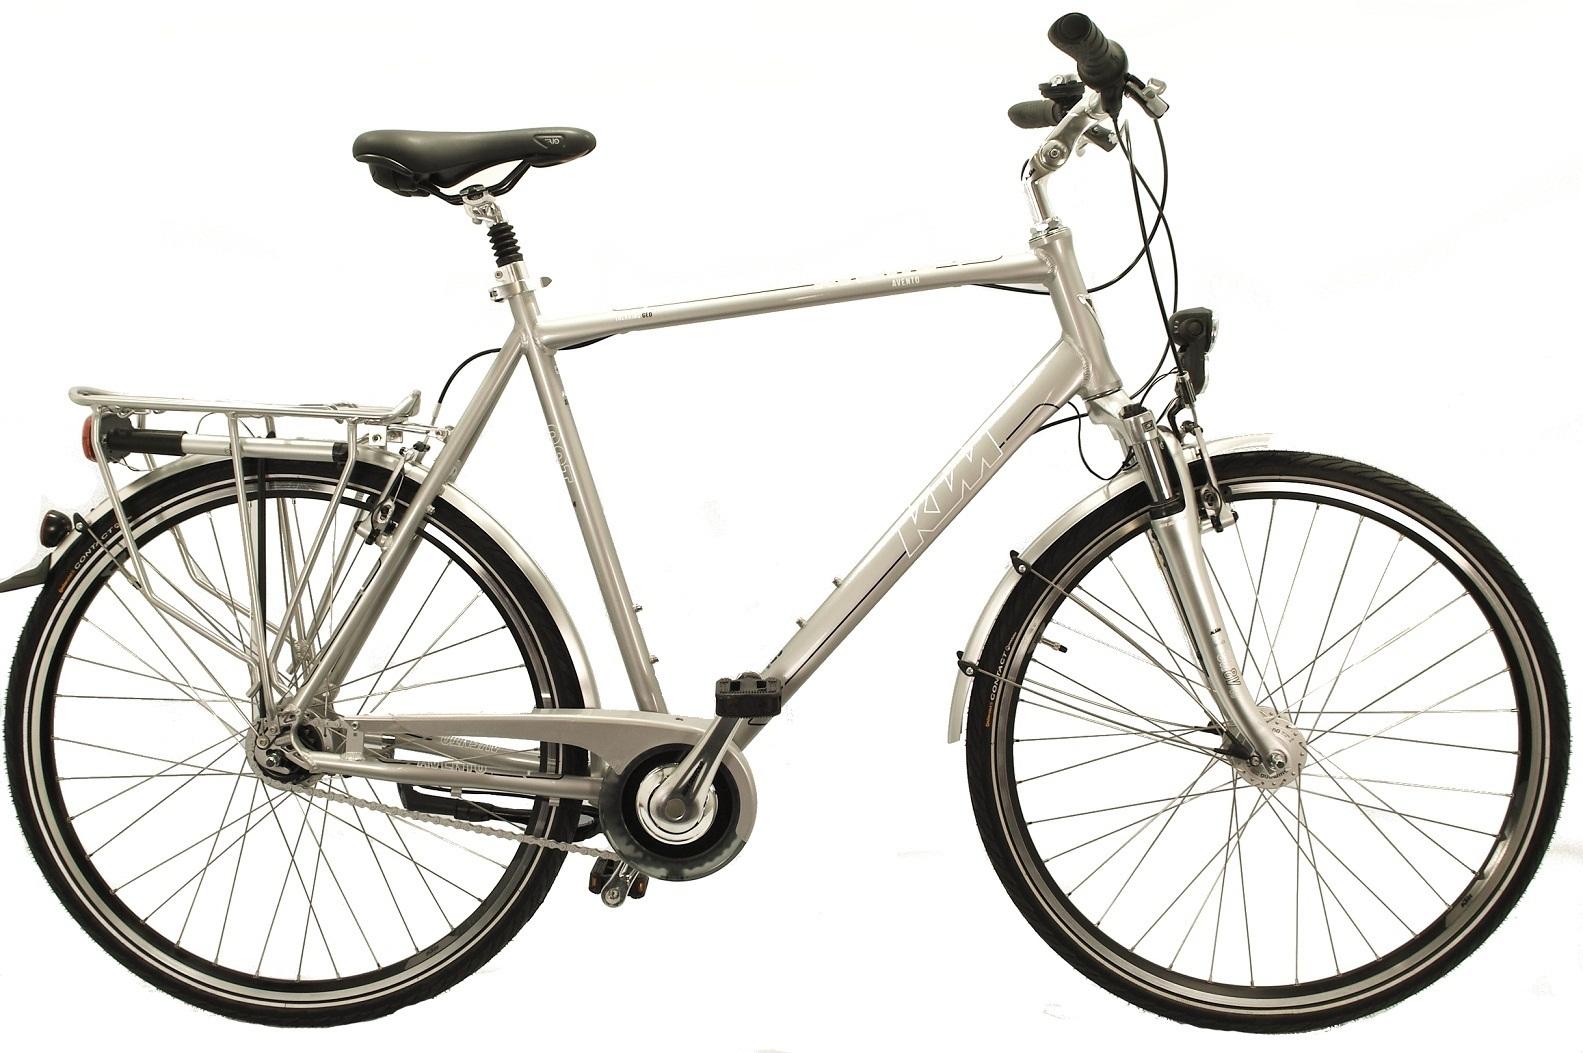 herren fahrrad ktm avento 8 28 zoll citybike shimano nexus. Black Bedroom Furniture Sets. Home Design Ideas